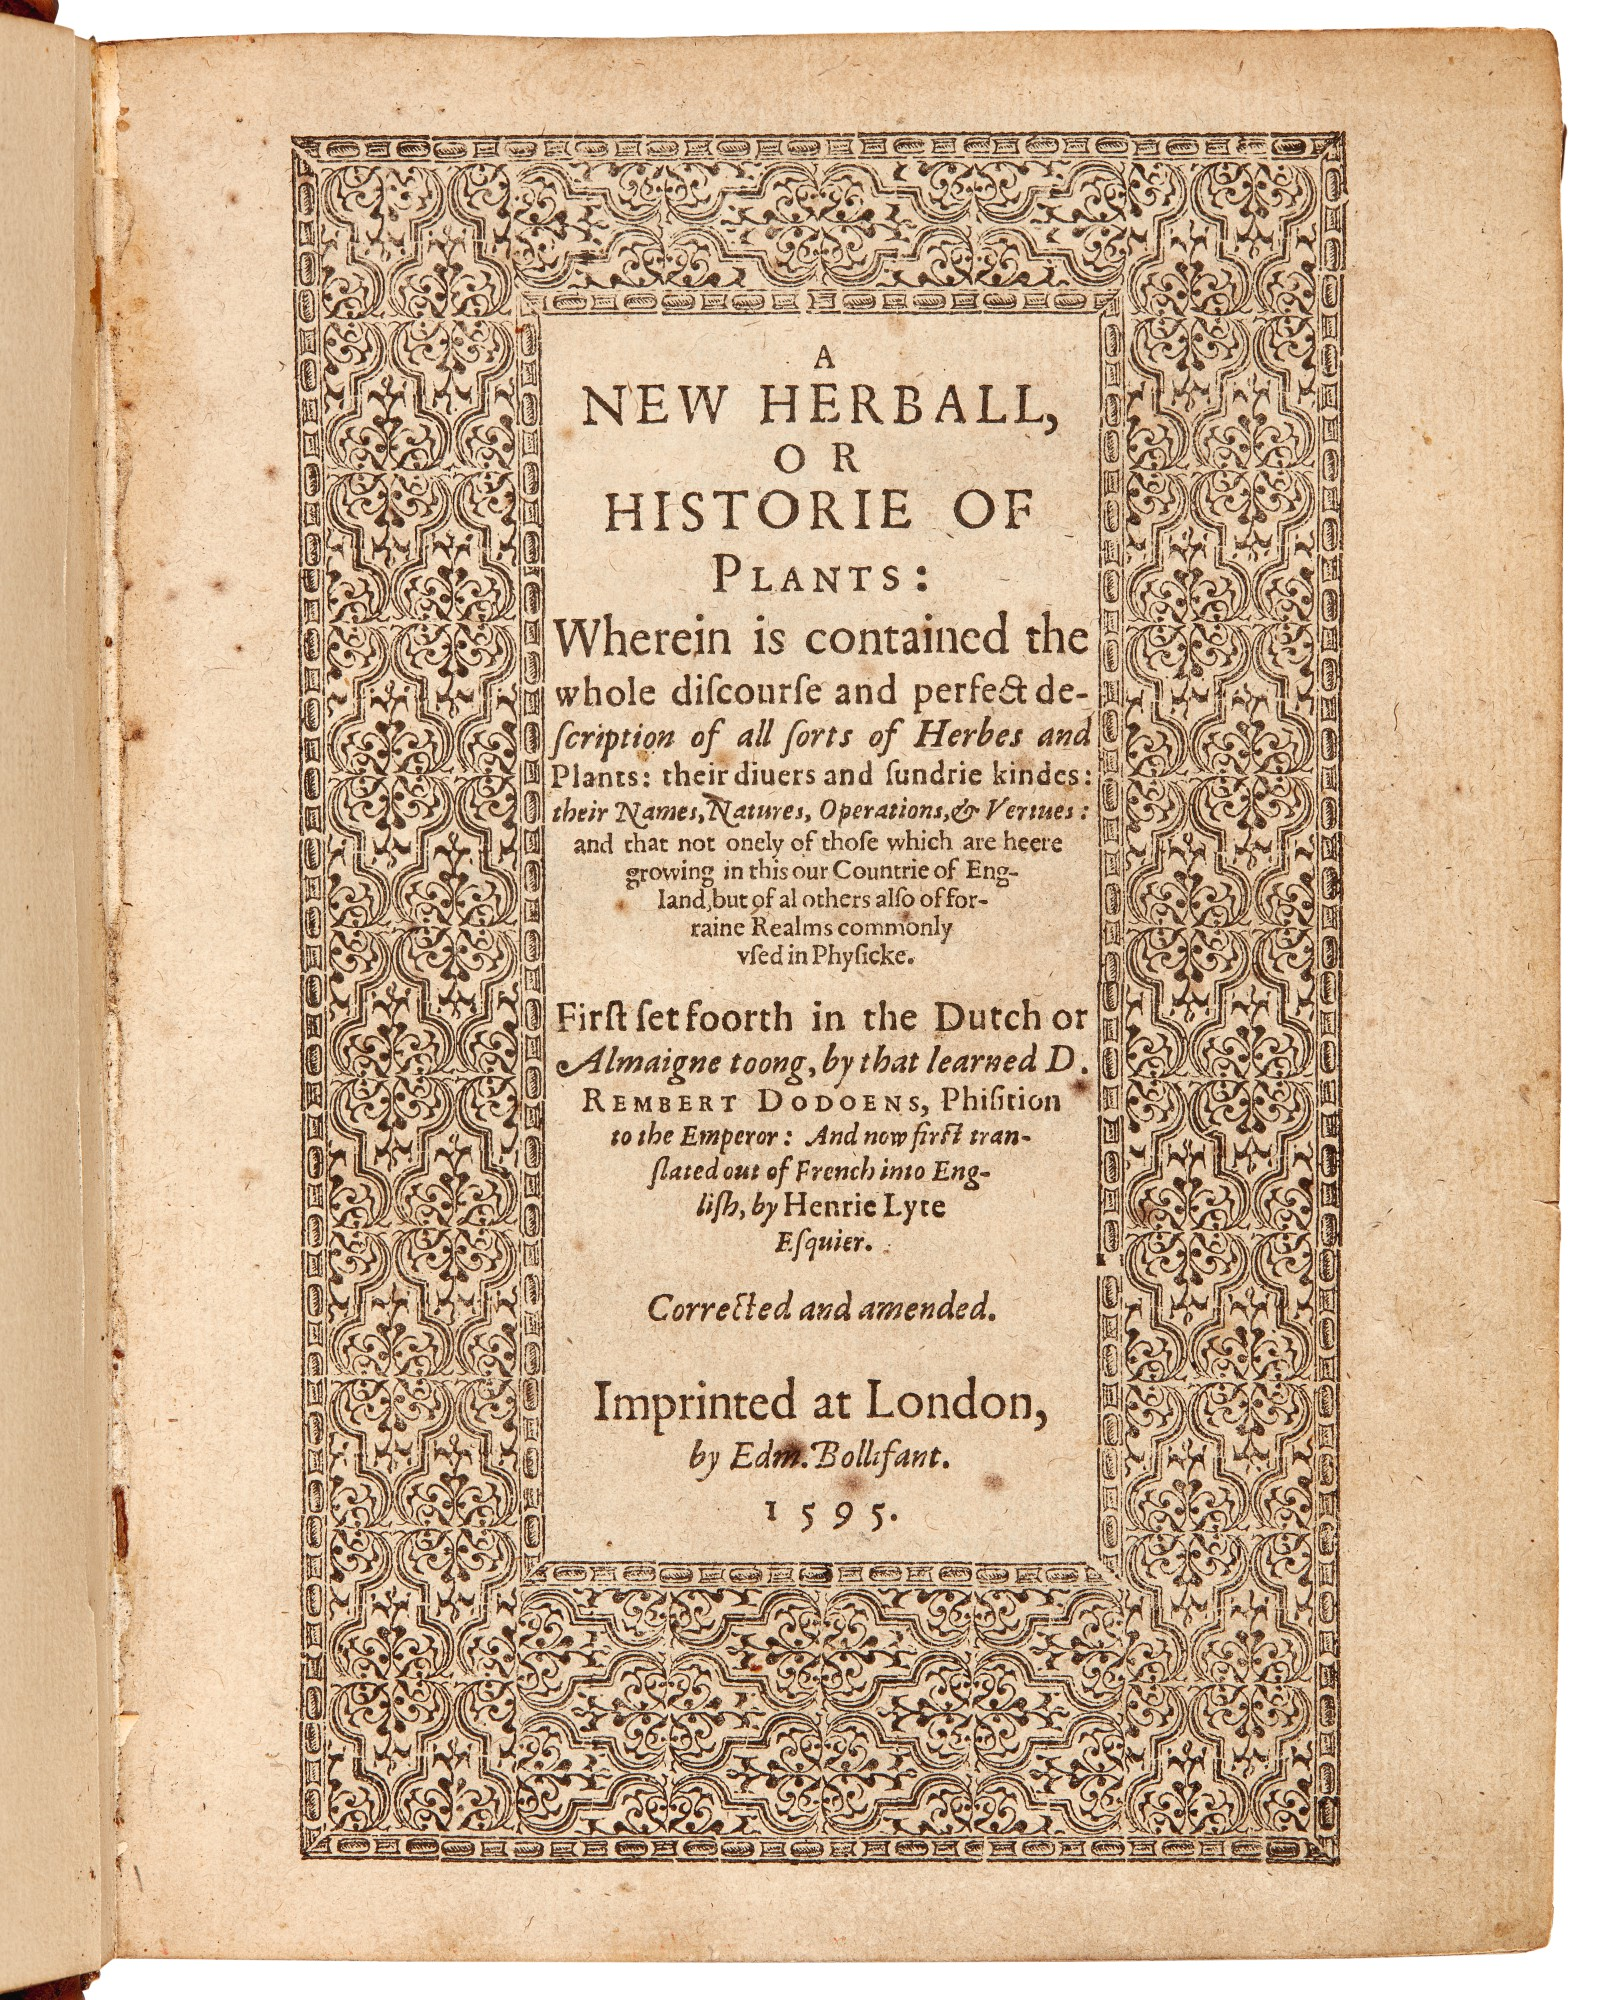 Dodoens |  A New Herball, 1595